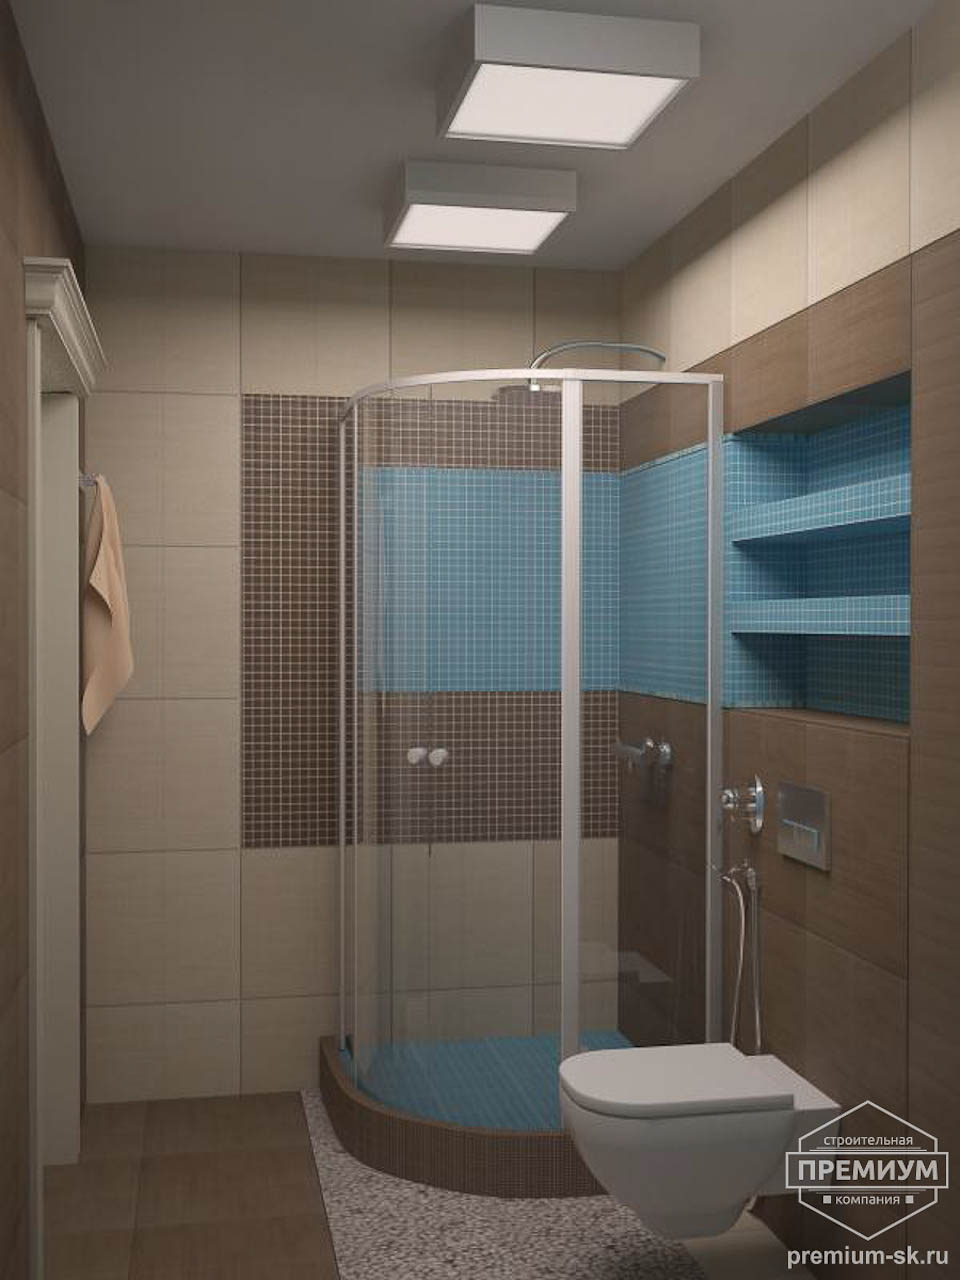 Дизайн интерьера однокомнатной квартиры по ул. Сыромолотова 11 img1477040339